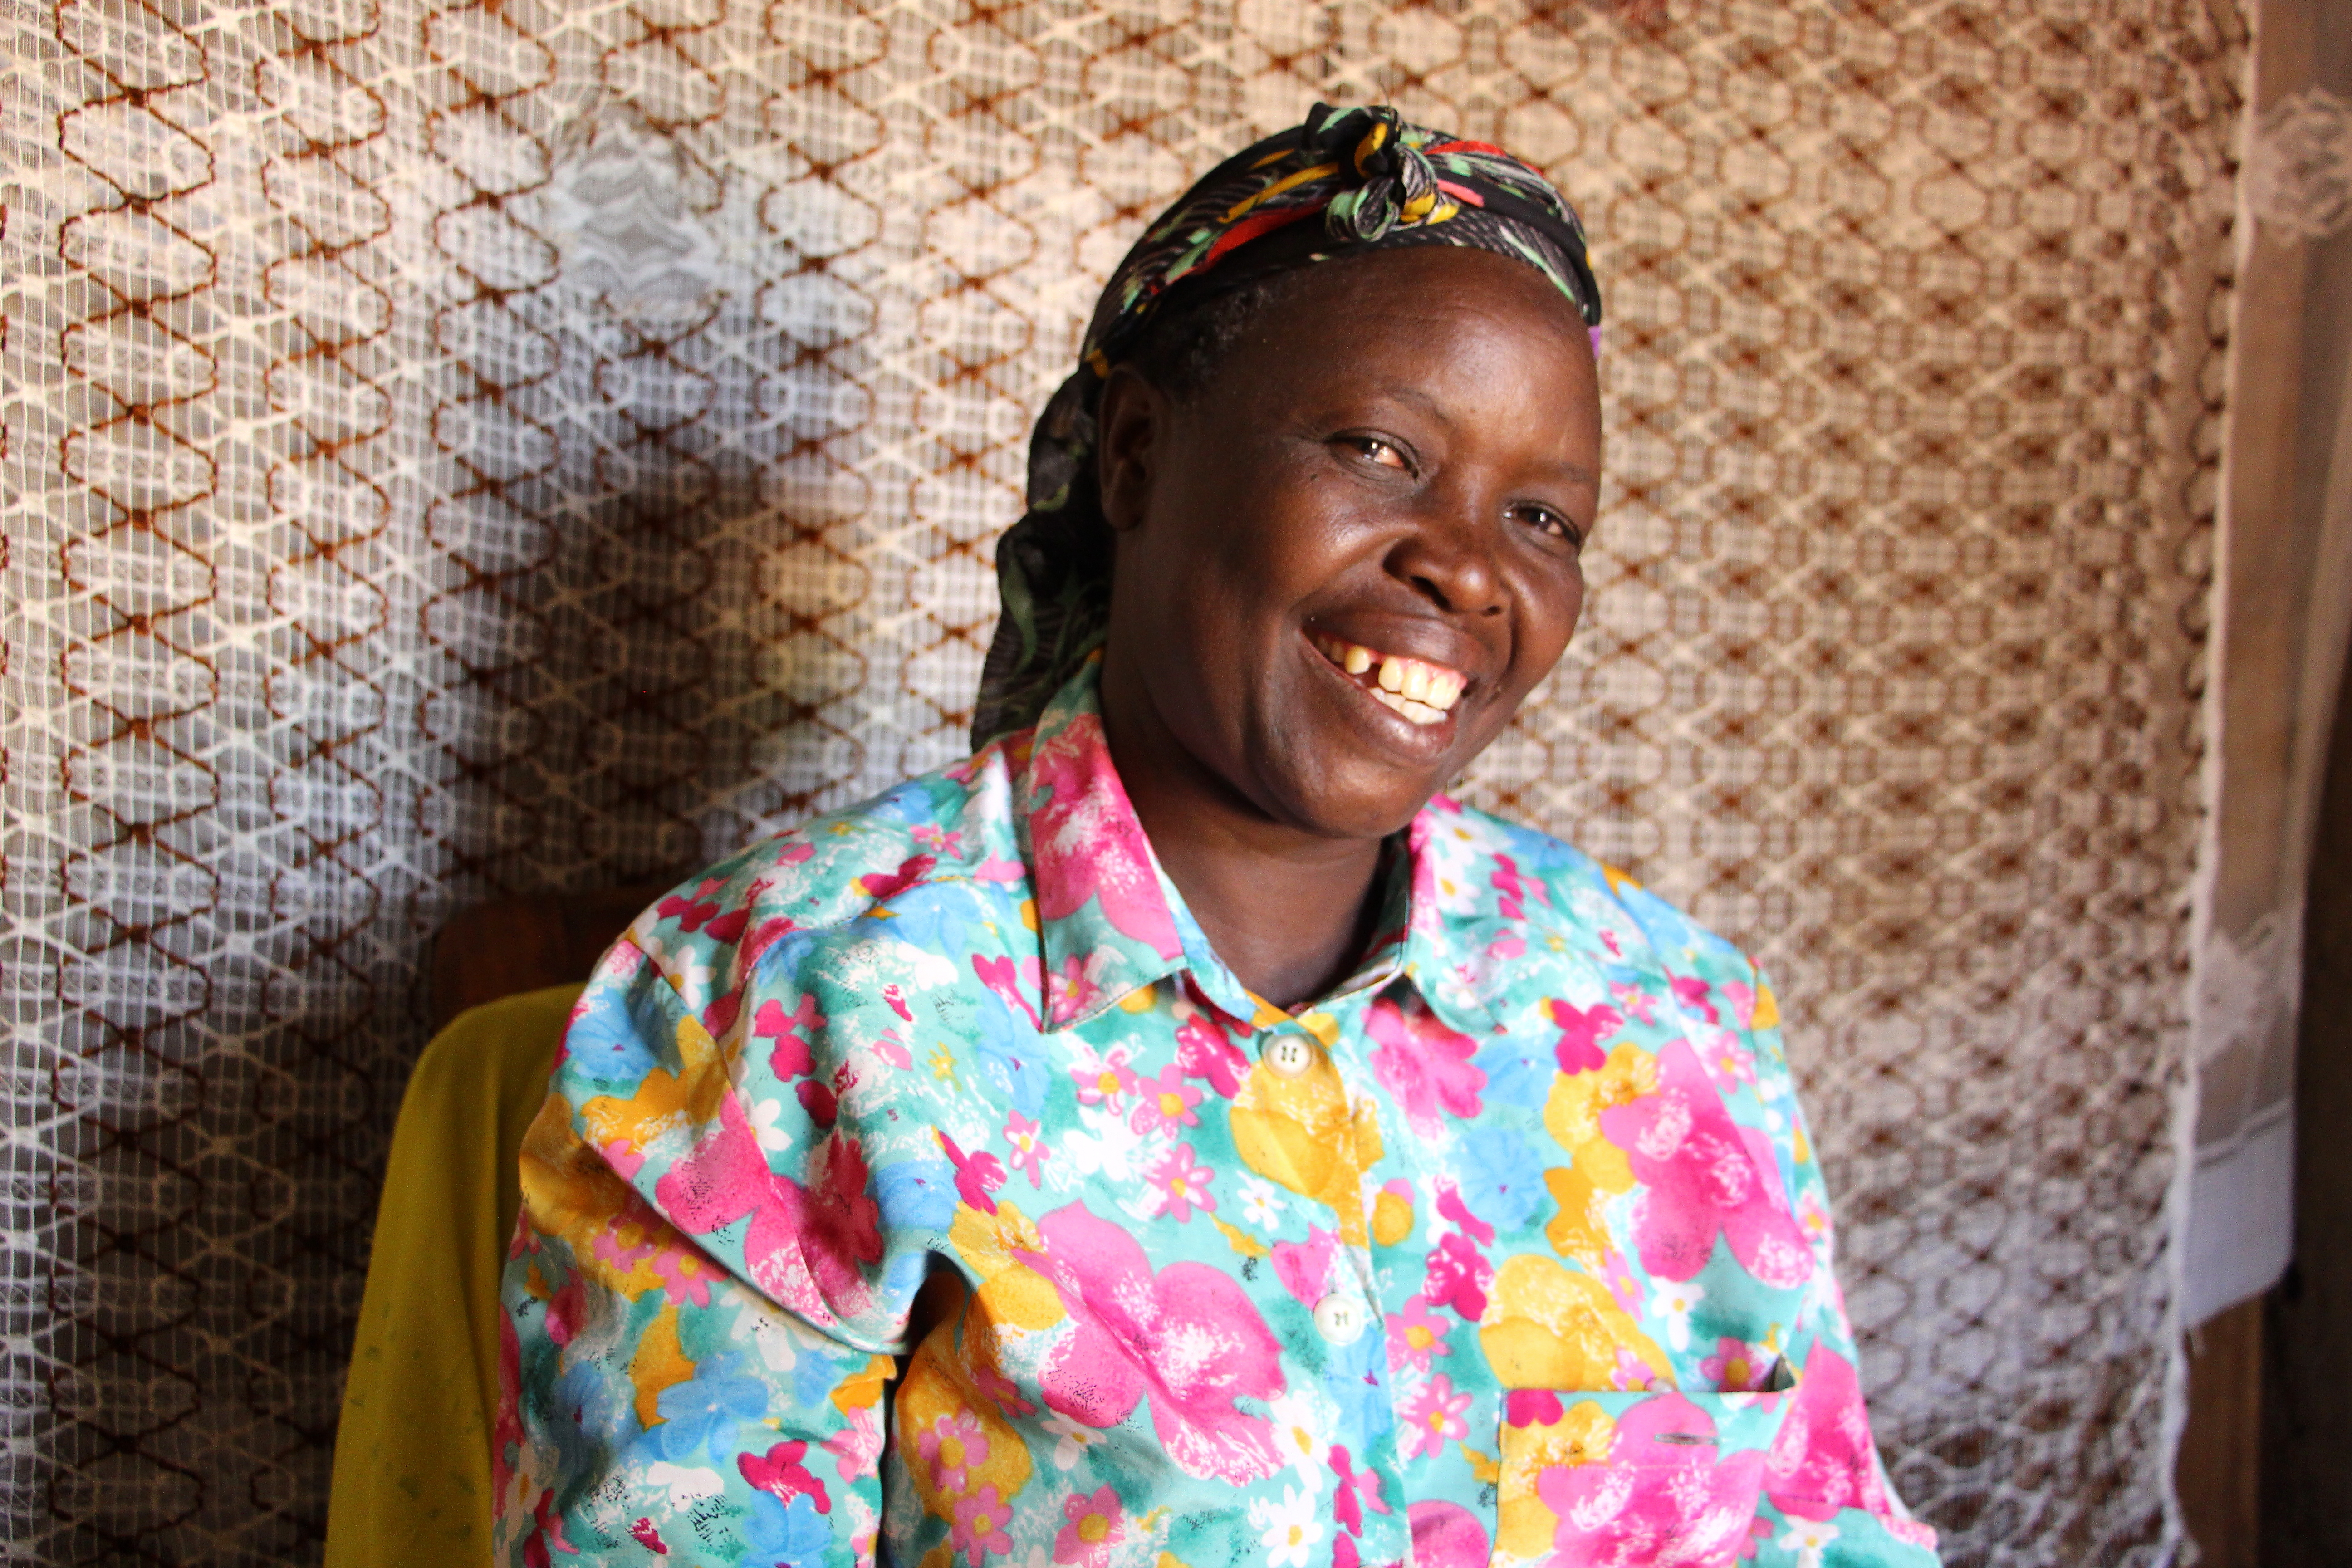 Catherine Mkangula, Village Enterprise business owner in her home in Chukura, Kenya.